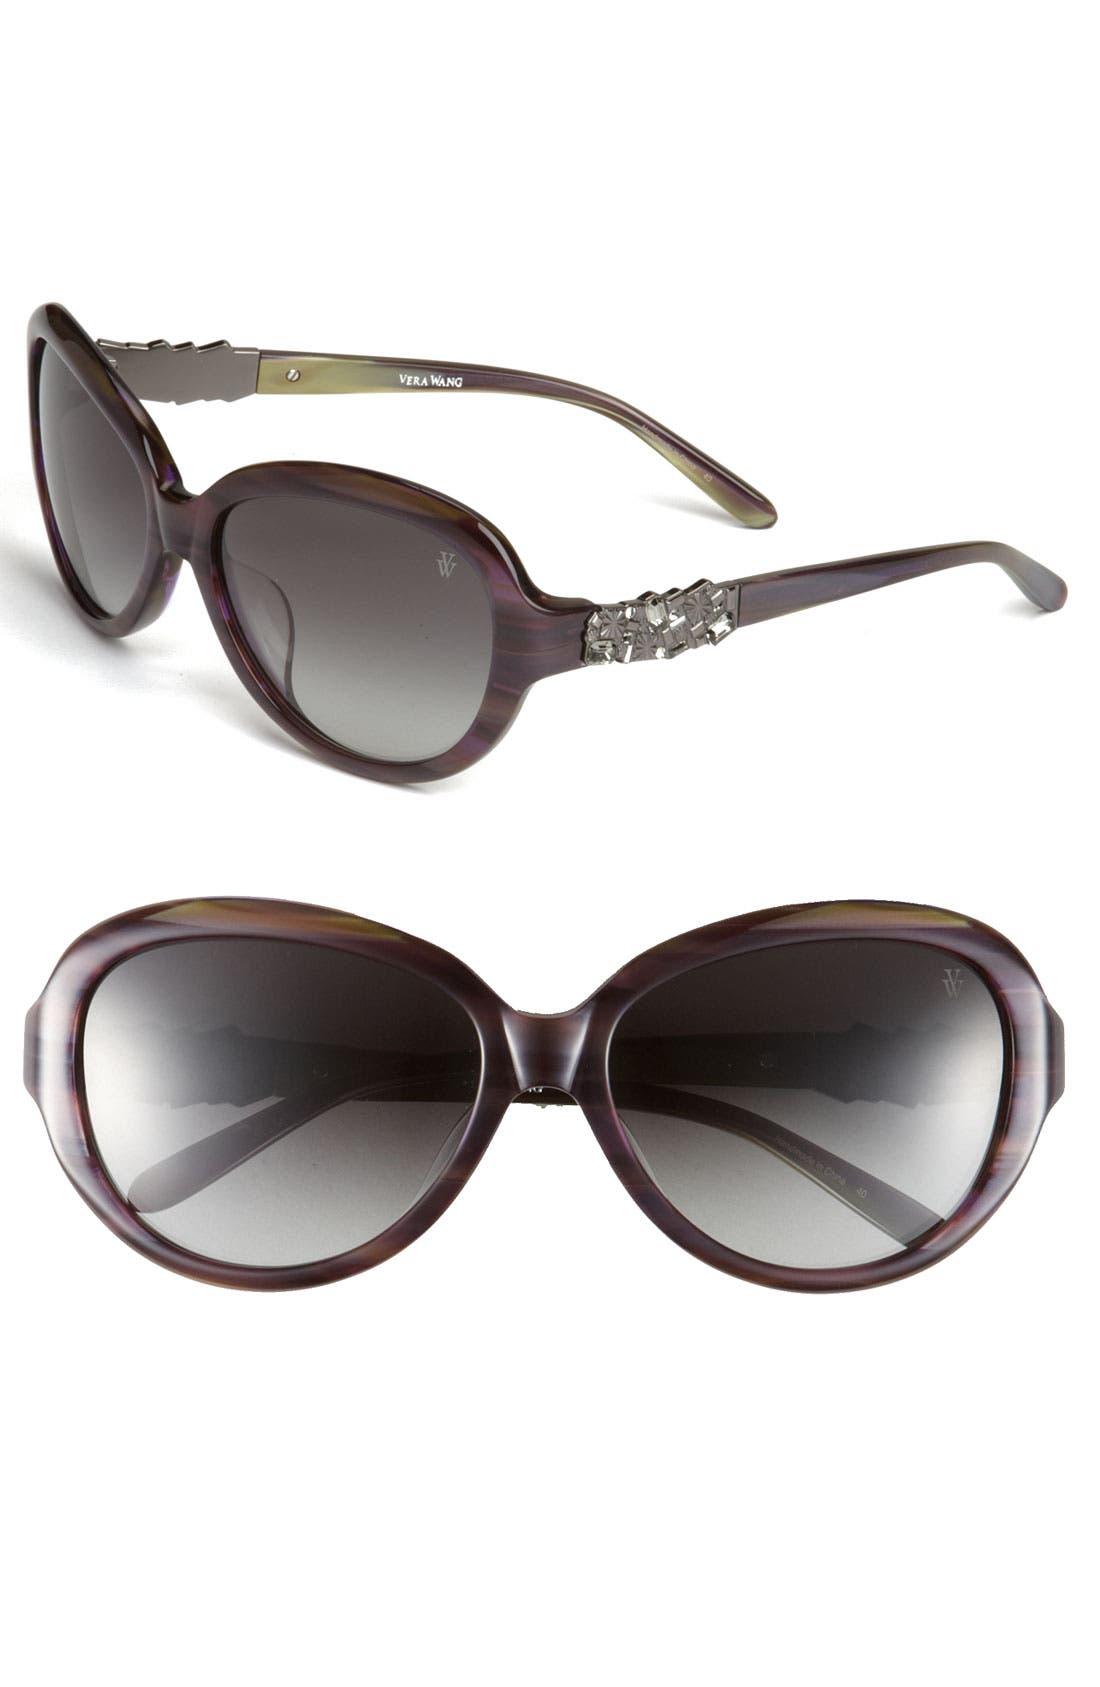 Alternate Image 1 Selected - Vera Wang 'Aquaria' Sunglasses